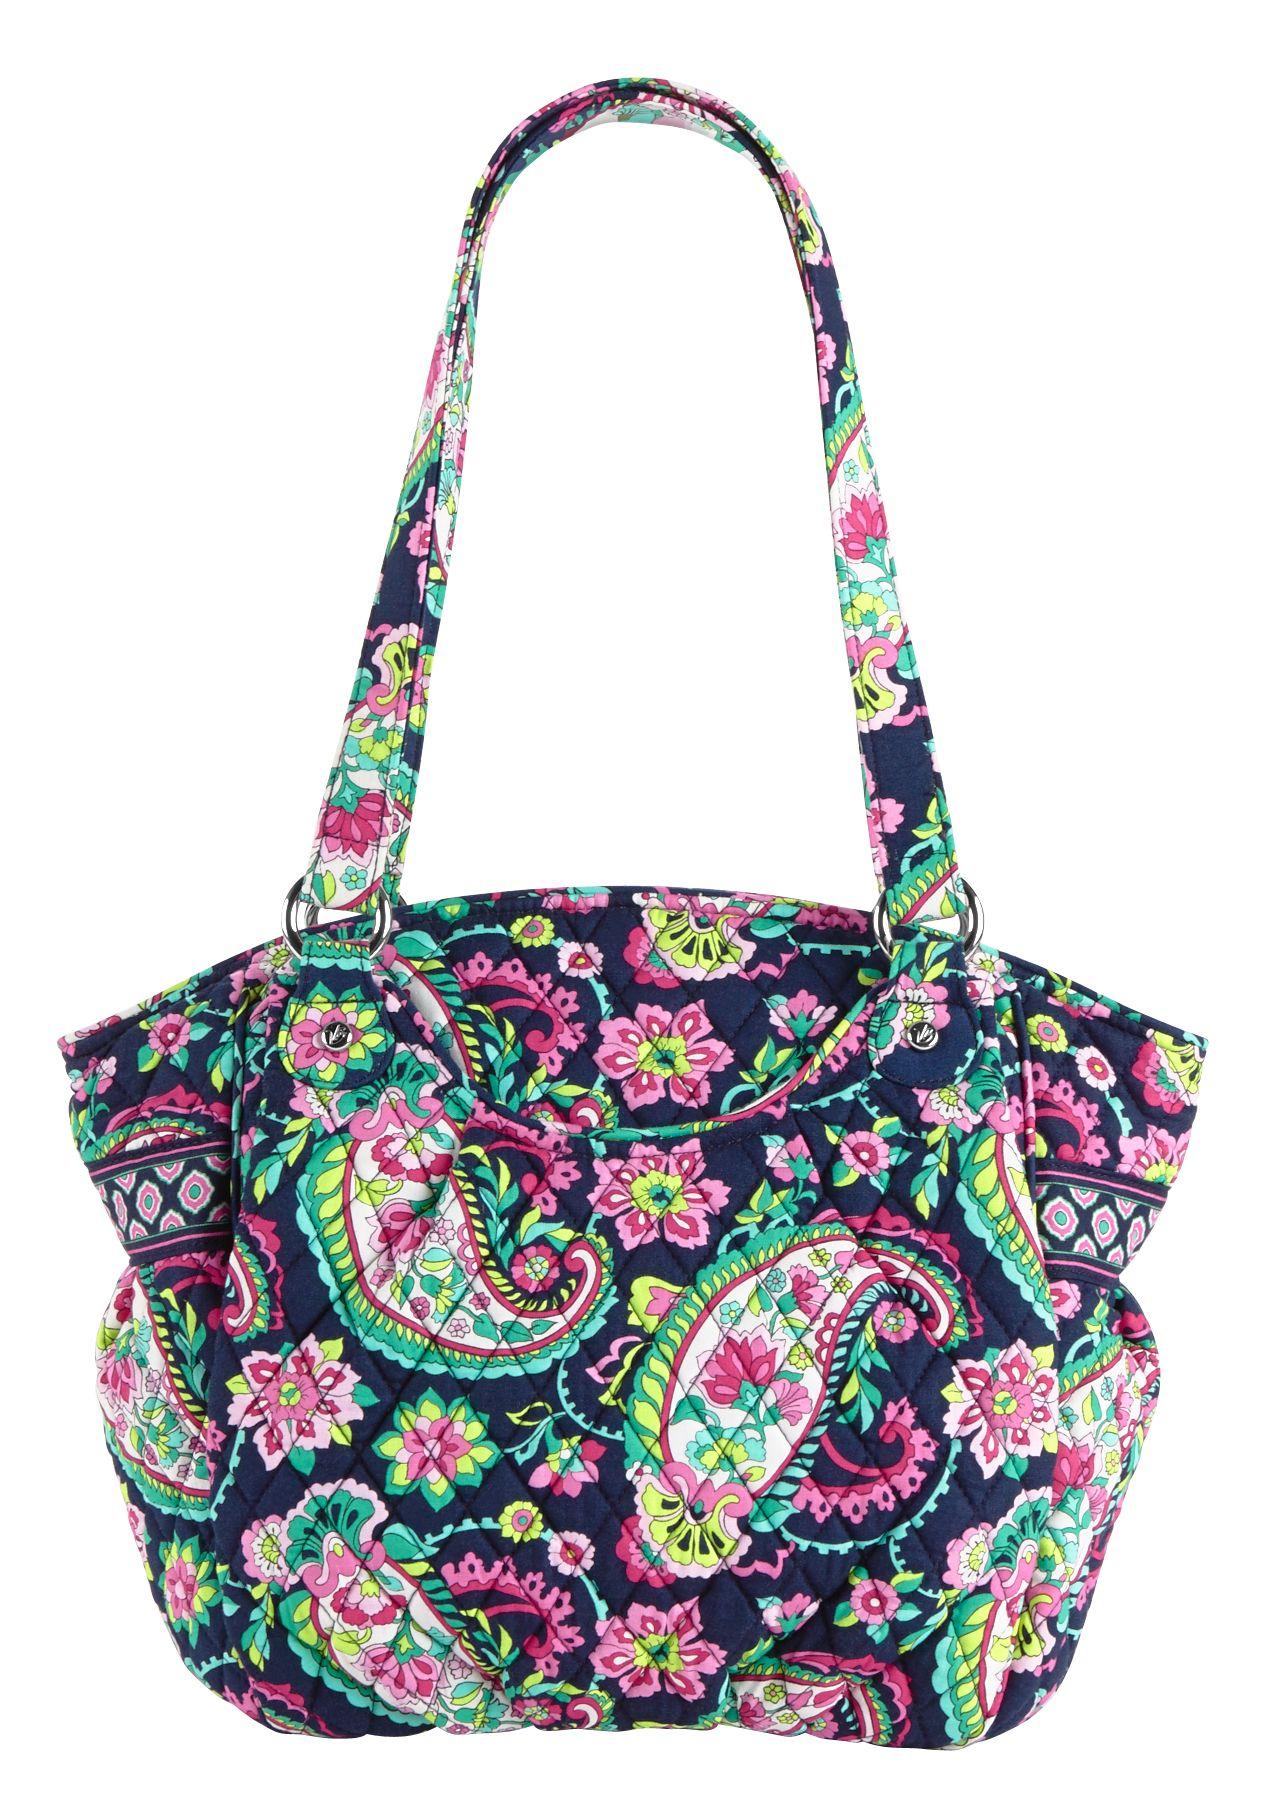 Vera Bradley Glenna Shoulder Bag in Petal Paisley